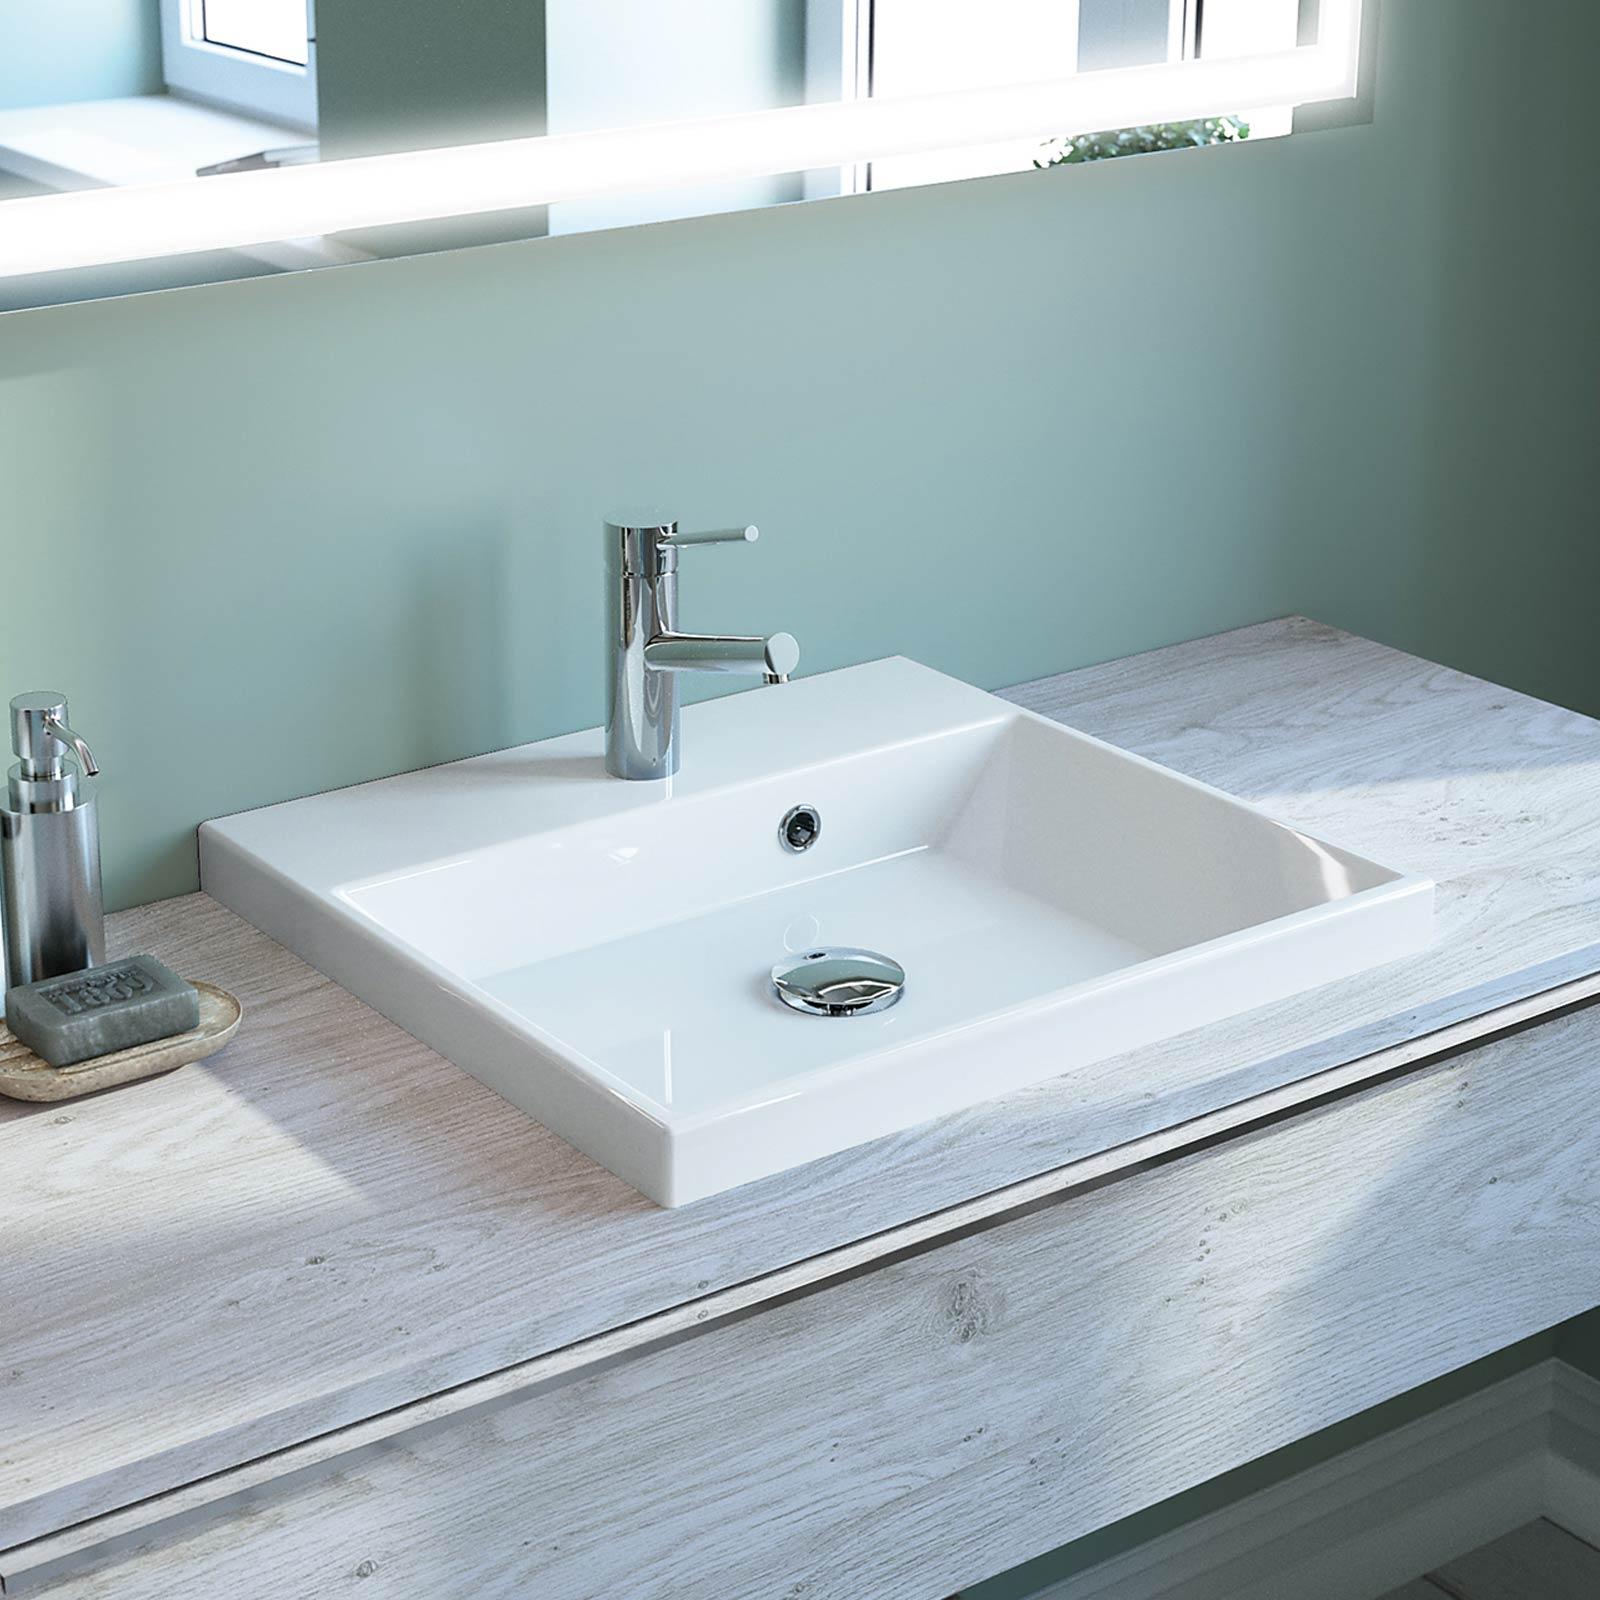 Vasques   Meubles de salle de bains, baignoires, fabricant ...